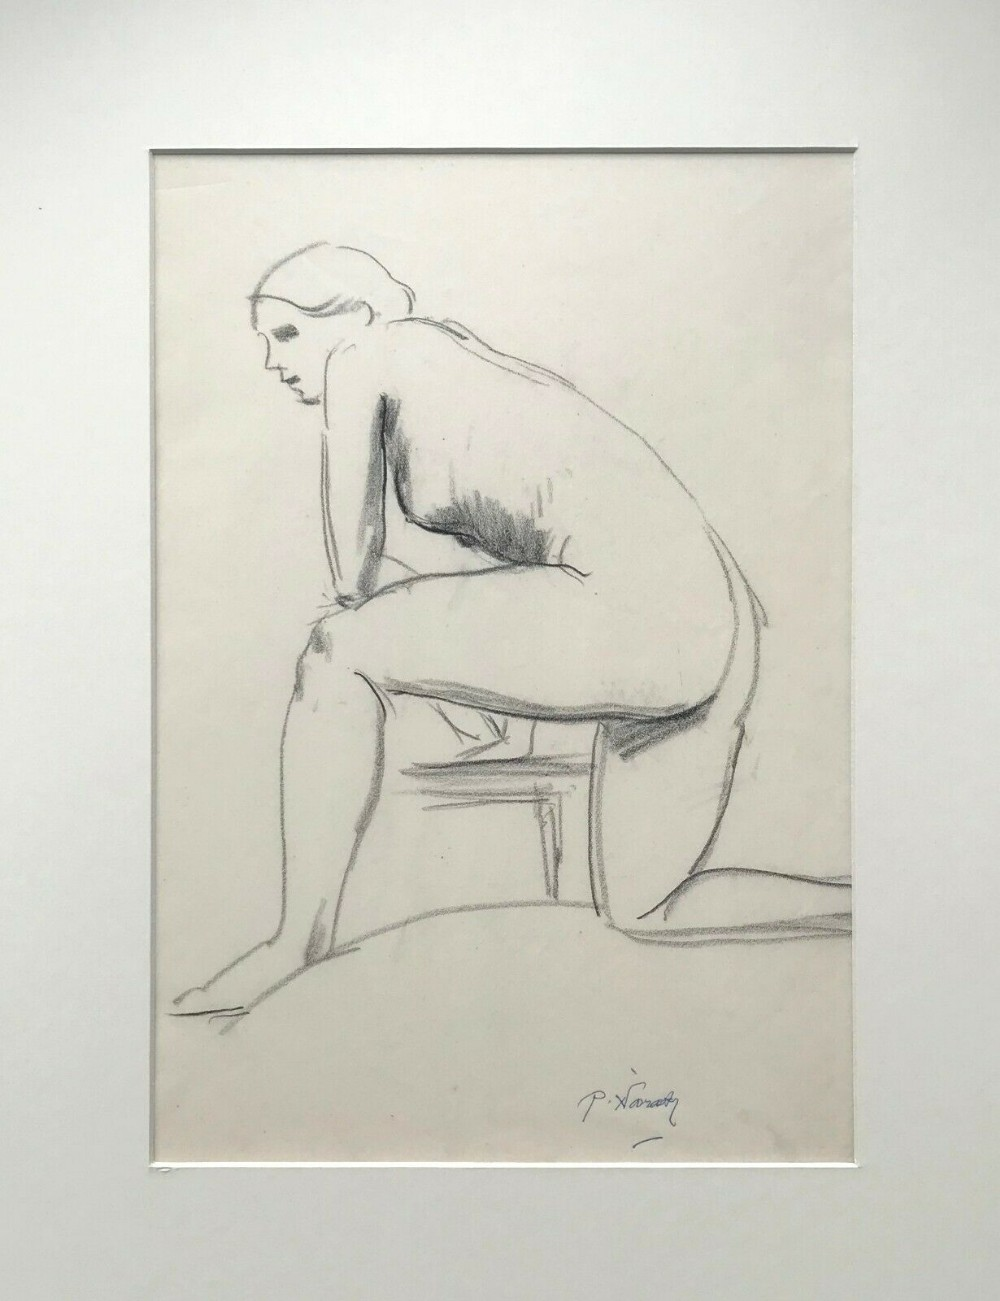 signed p philip naviasky original 20th century pencil drawing life study sketch nude woman